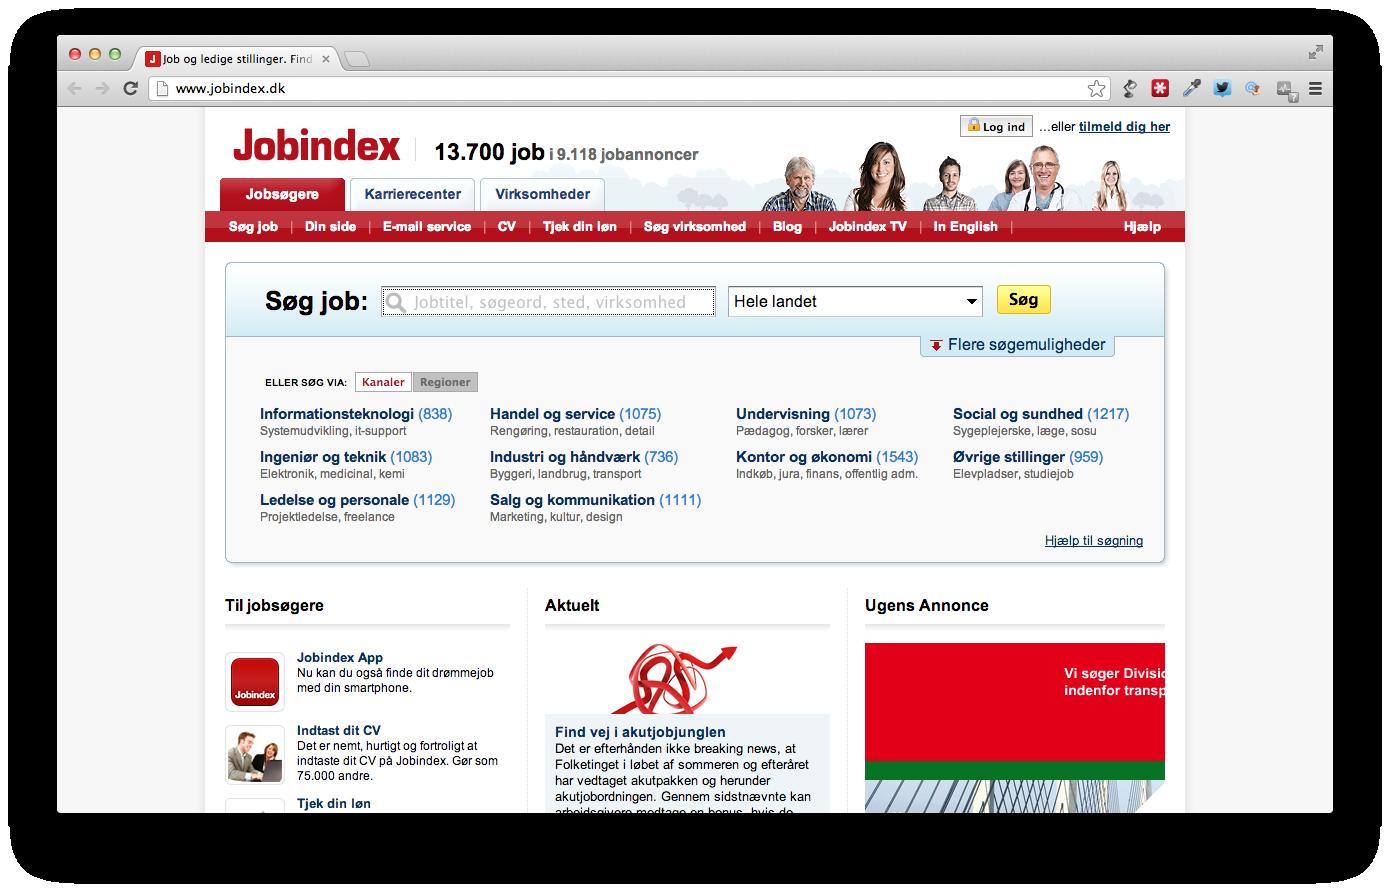 Podcast # 110 – Kaare Danielsen – Jobindex.dk